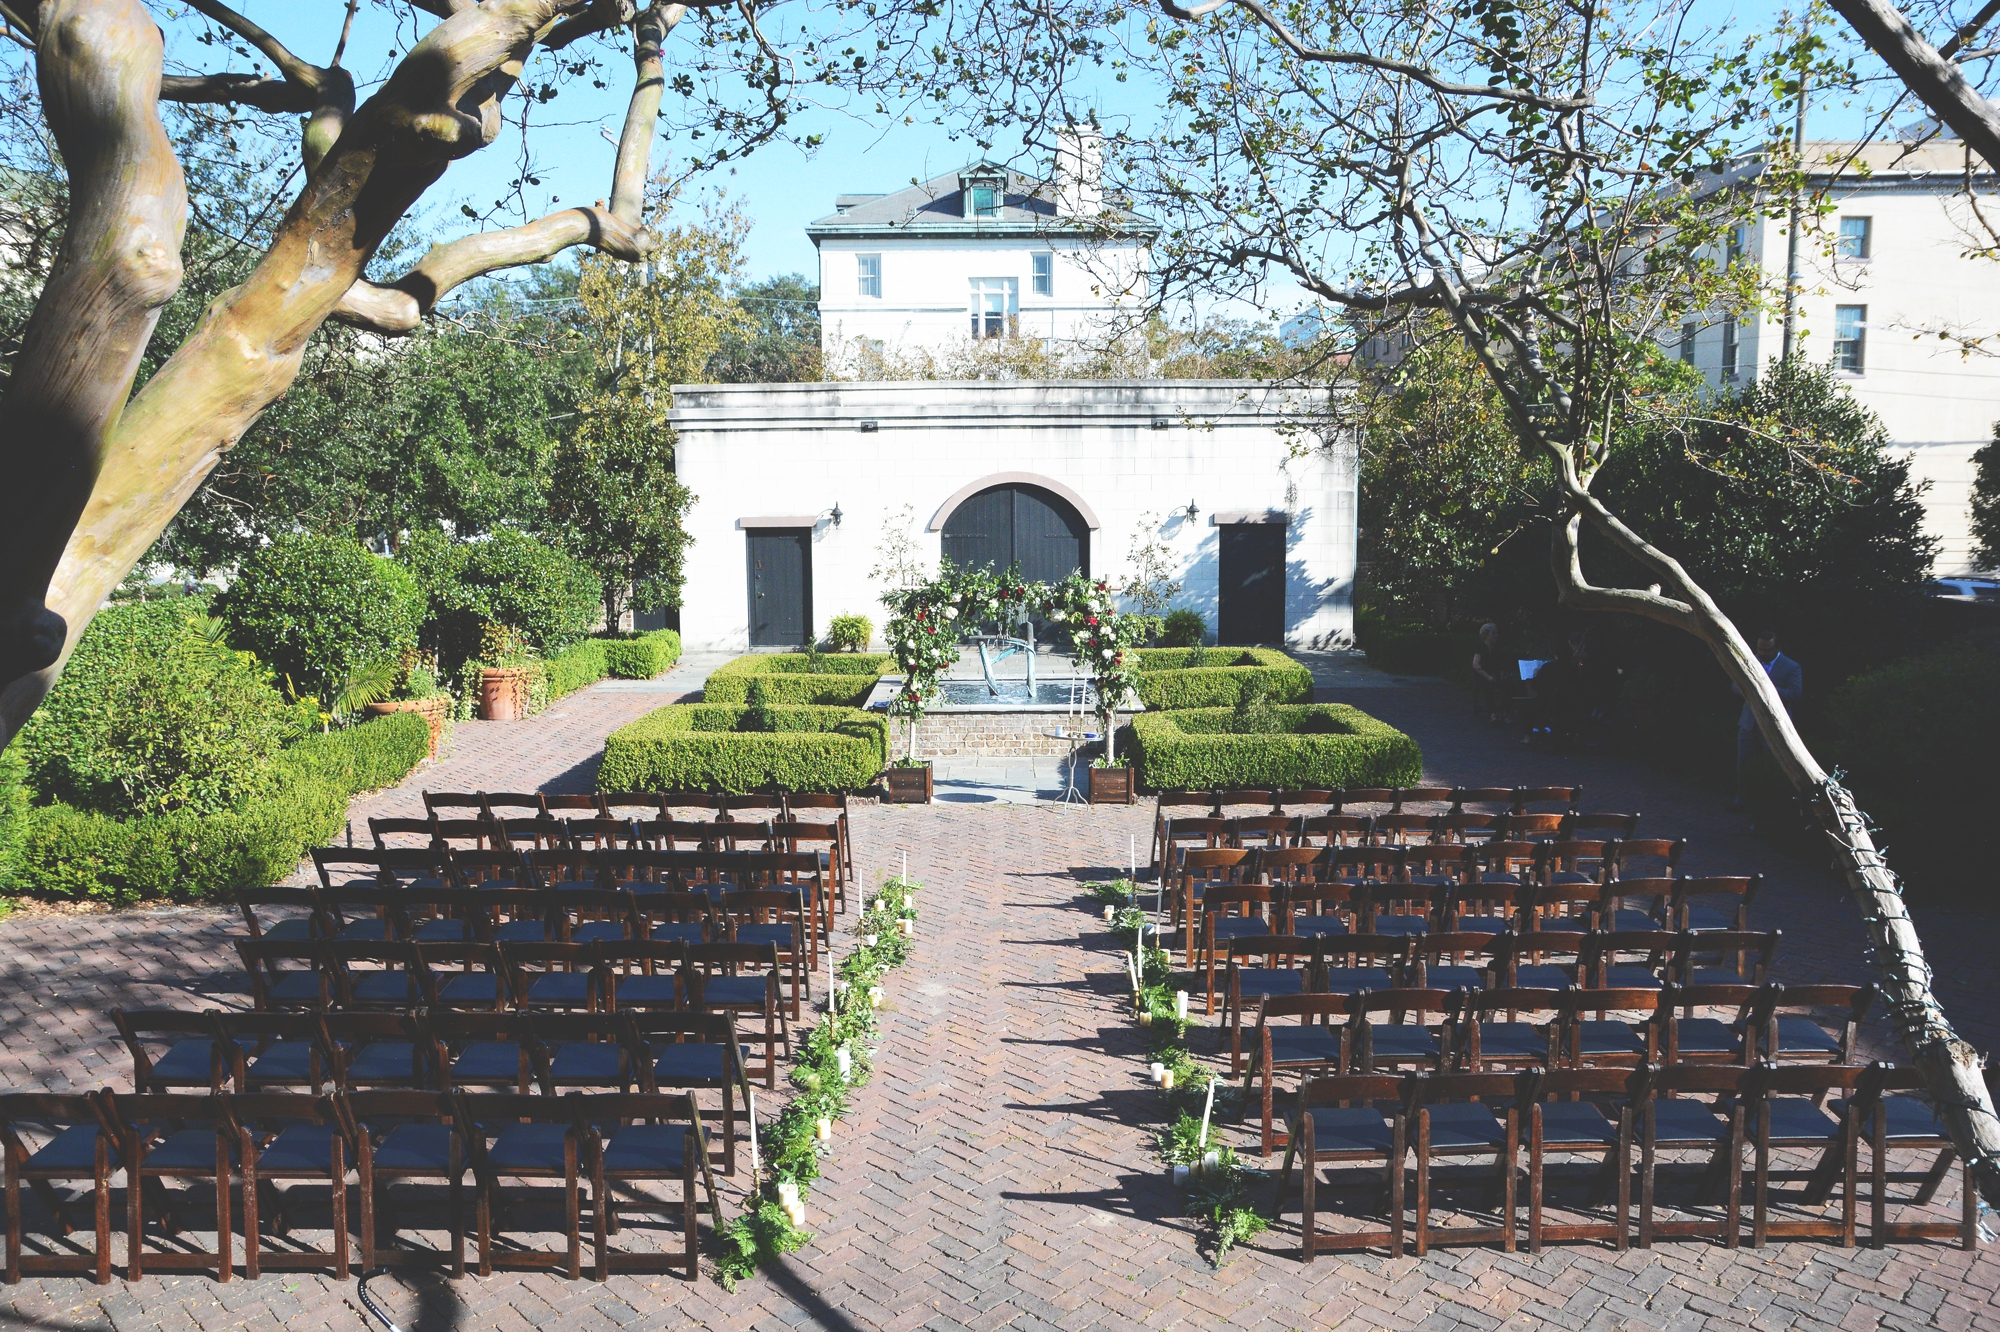 savannah-ga-harper-fowlkes-house-soho-south-cafe-wedding-six-hearts-photography029